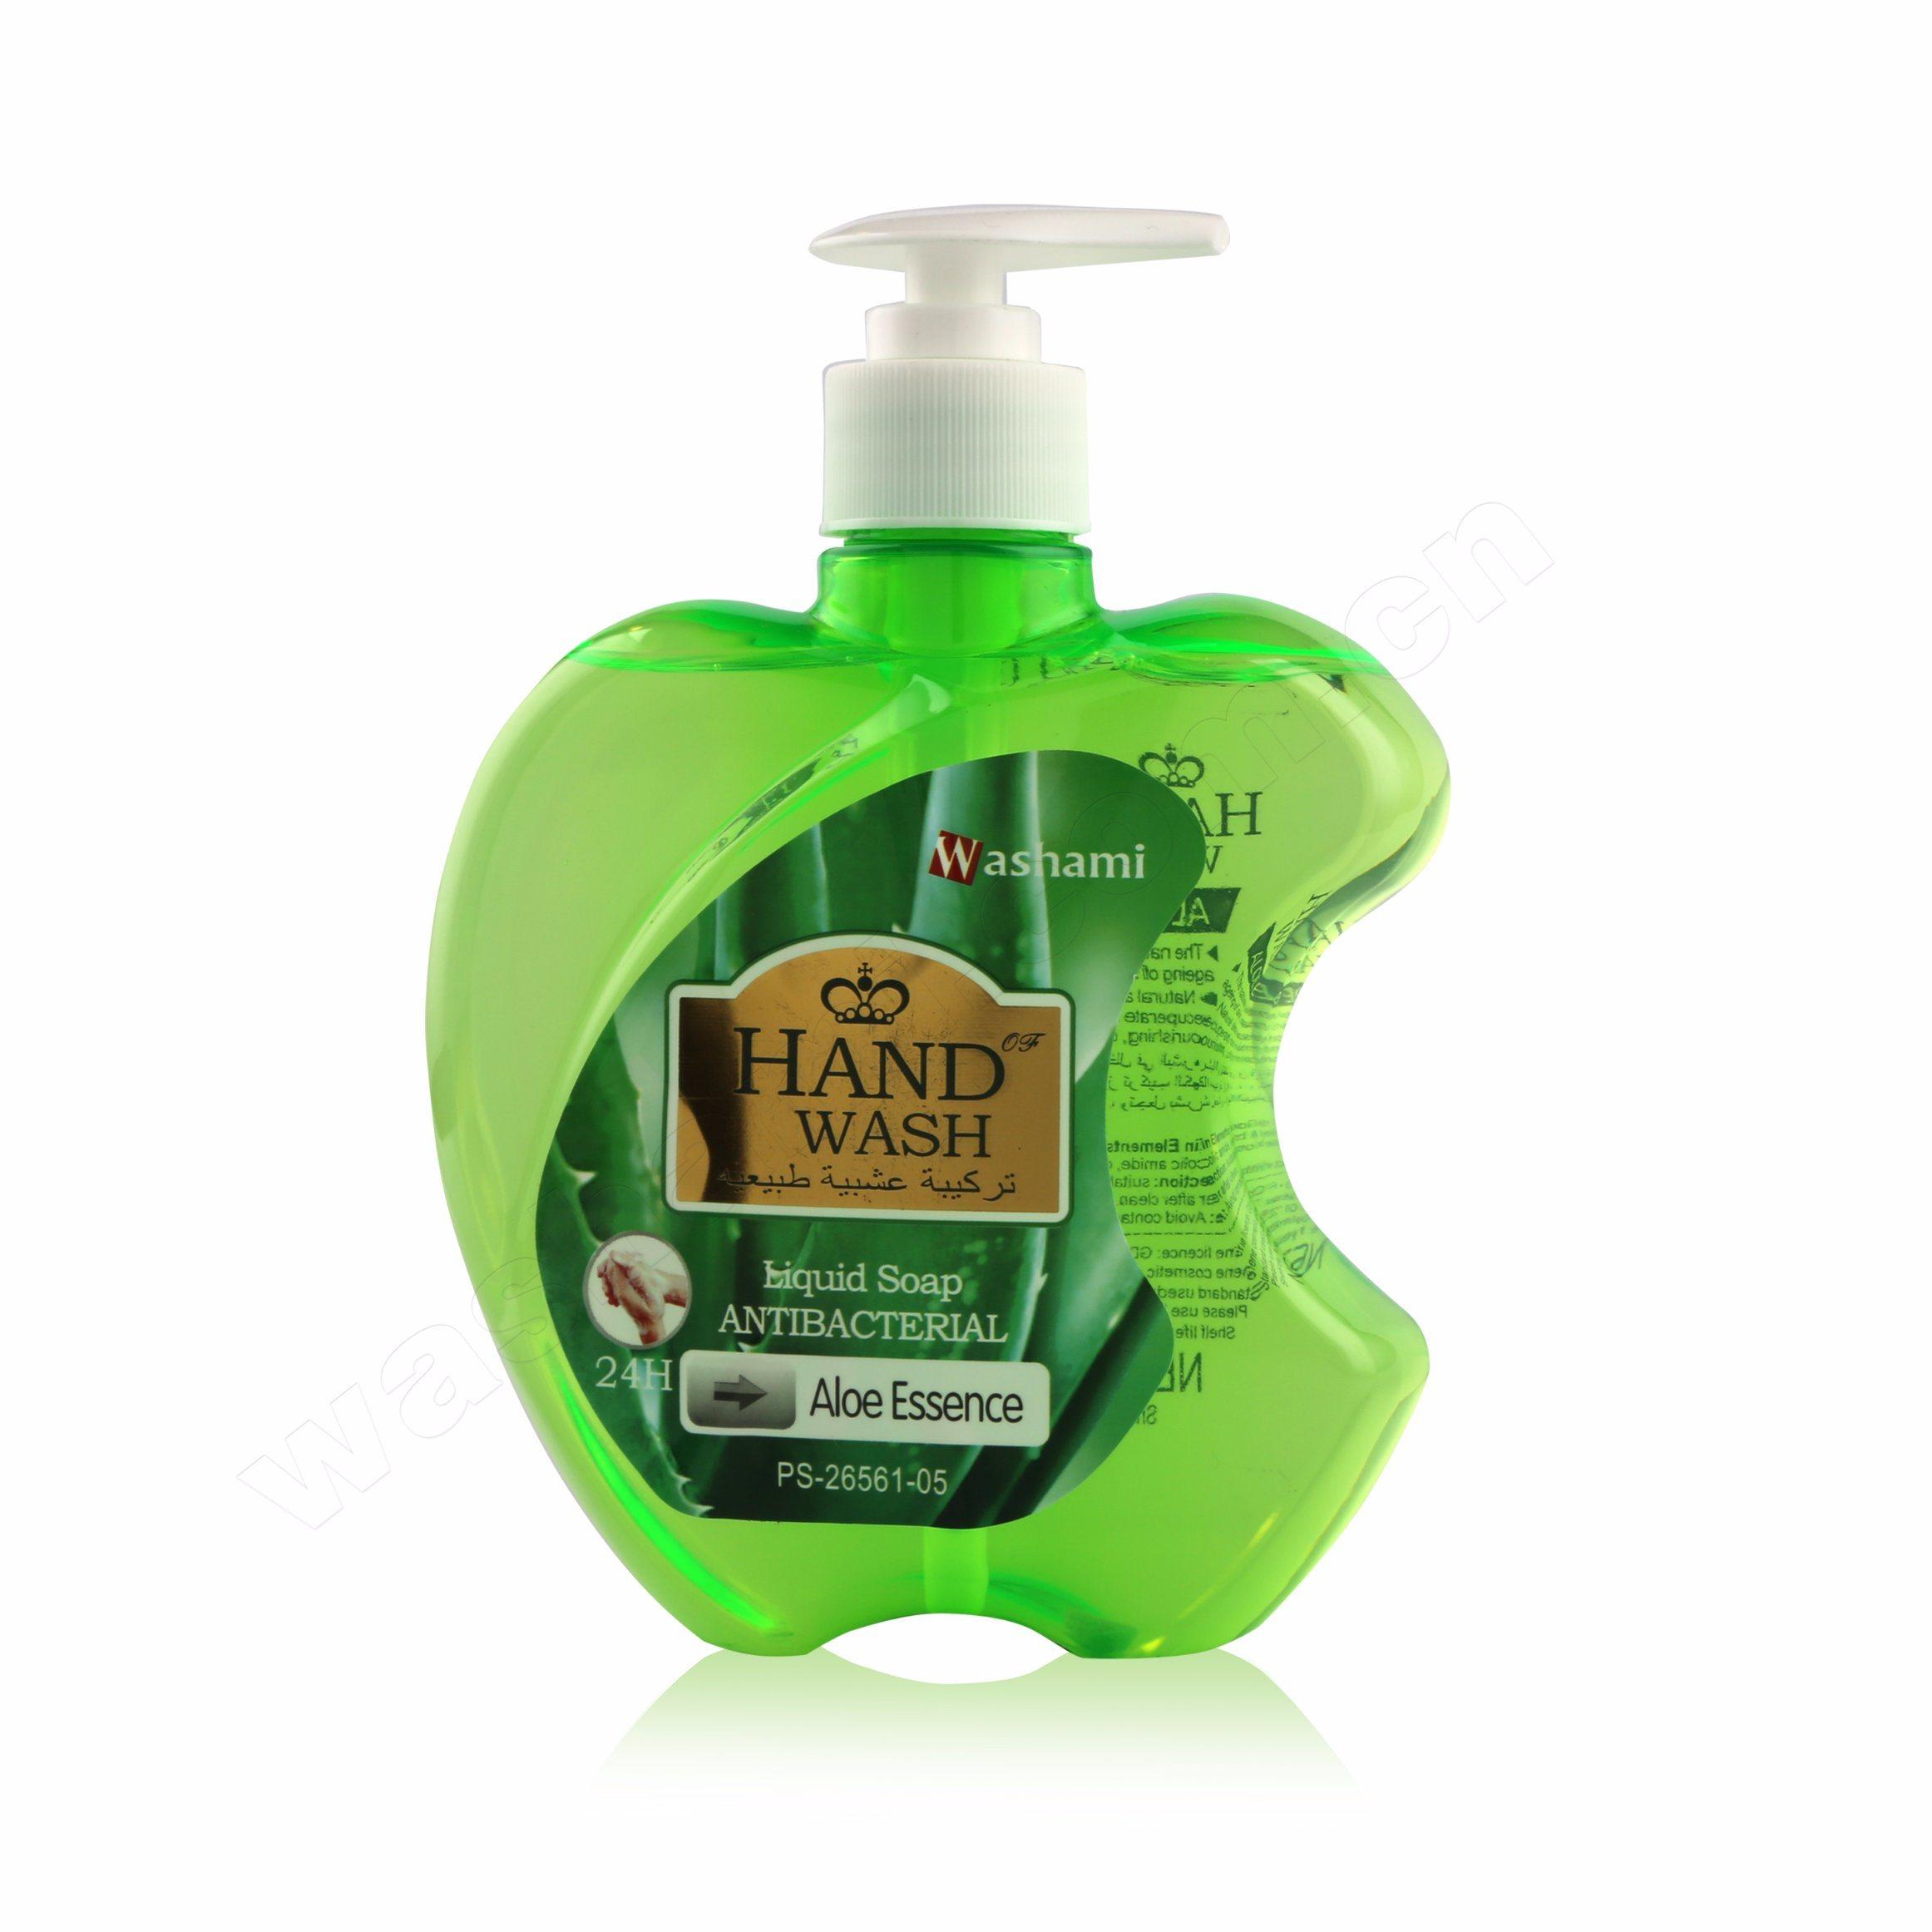 Washami 24 Hour Care Antibacterial Liquid Soap Hand Wash